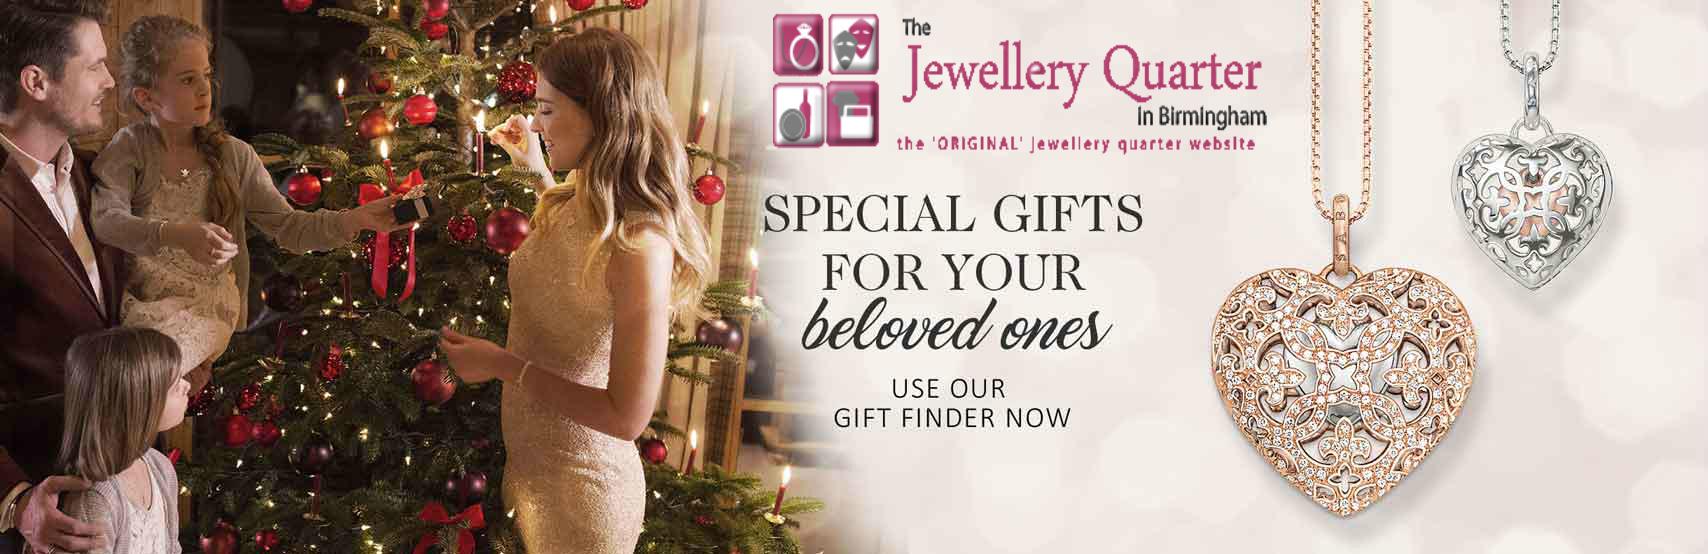 jewellery-quarter-birmingham